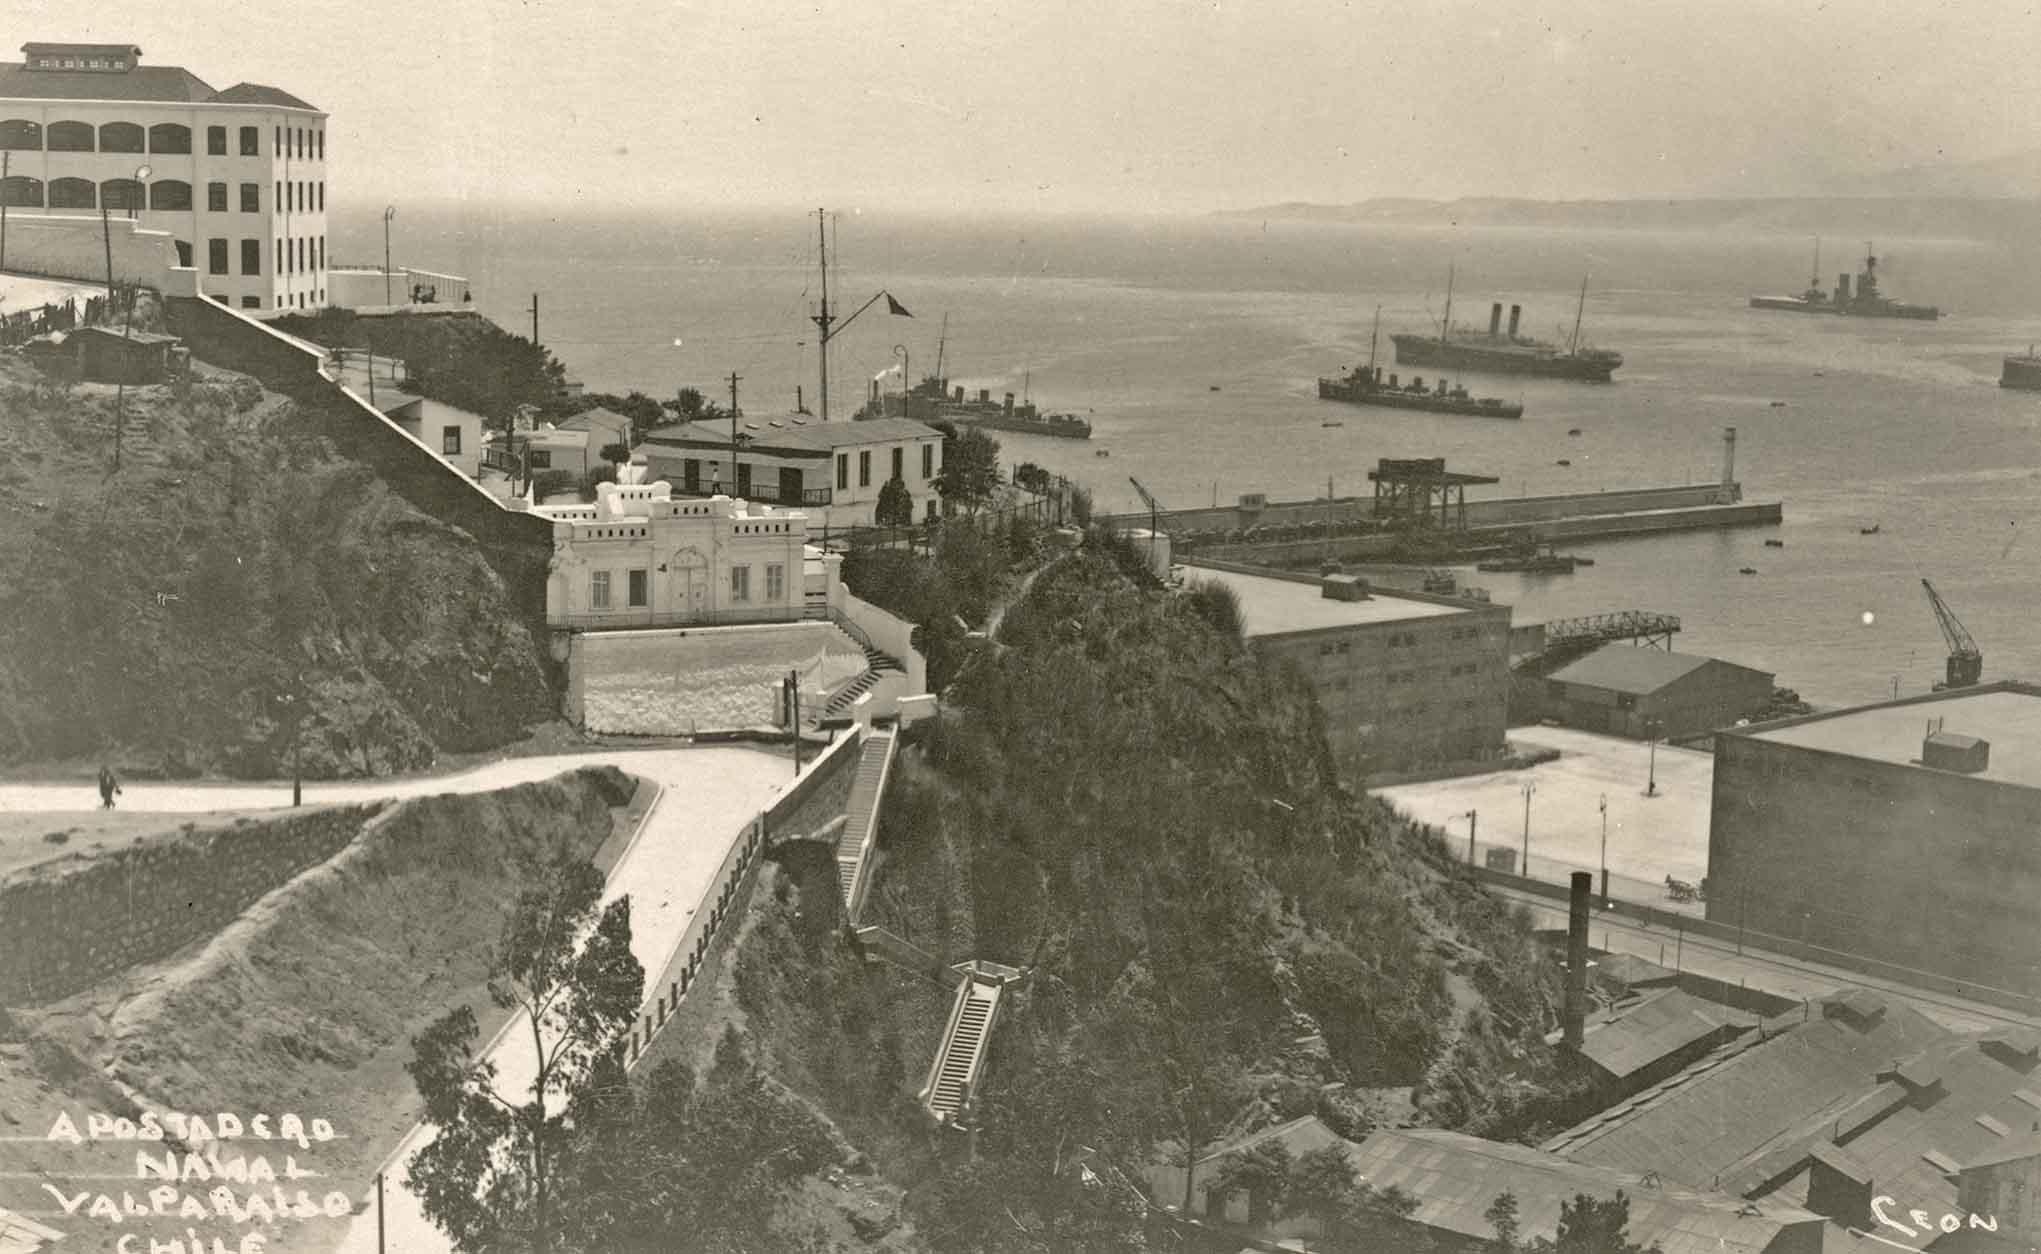 Enterreno - Fotos históricas de chile - fotos antiguas de Chile - Aposadero Naval de Valparaíso en 1920